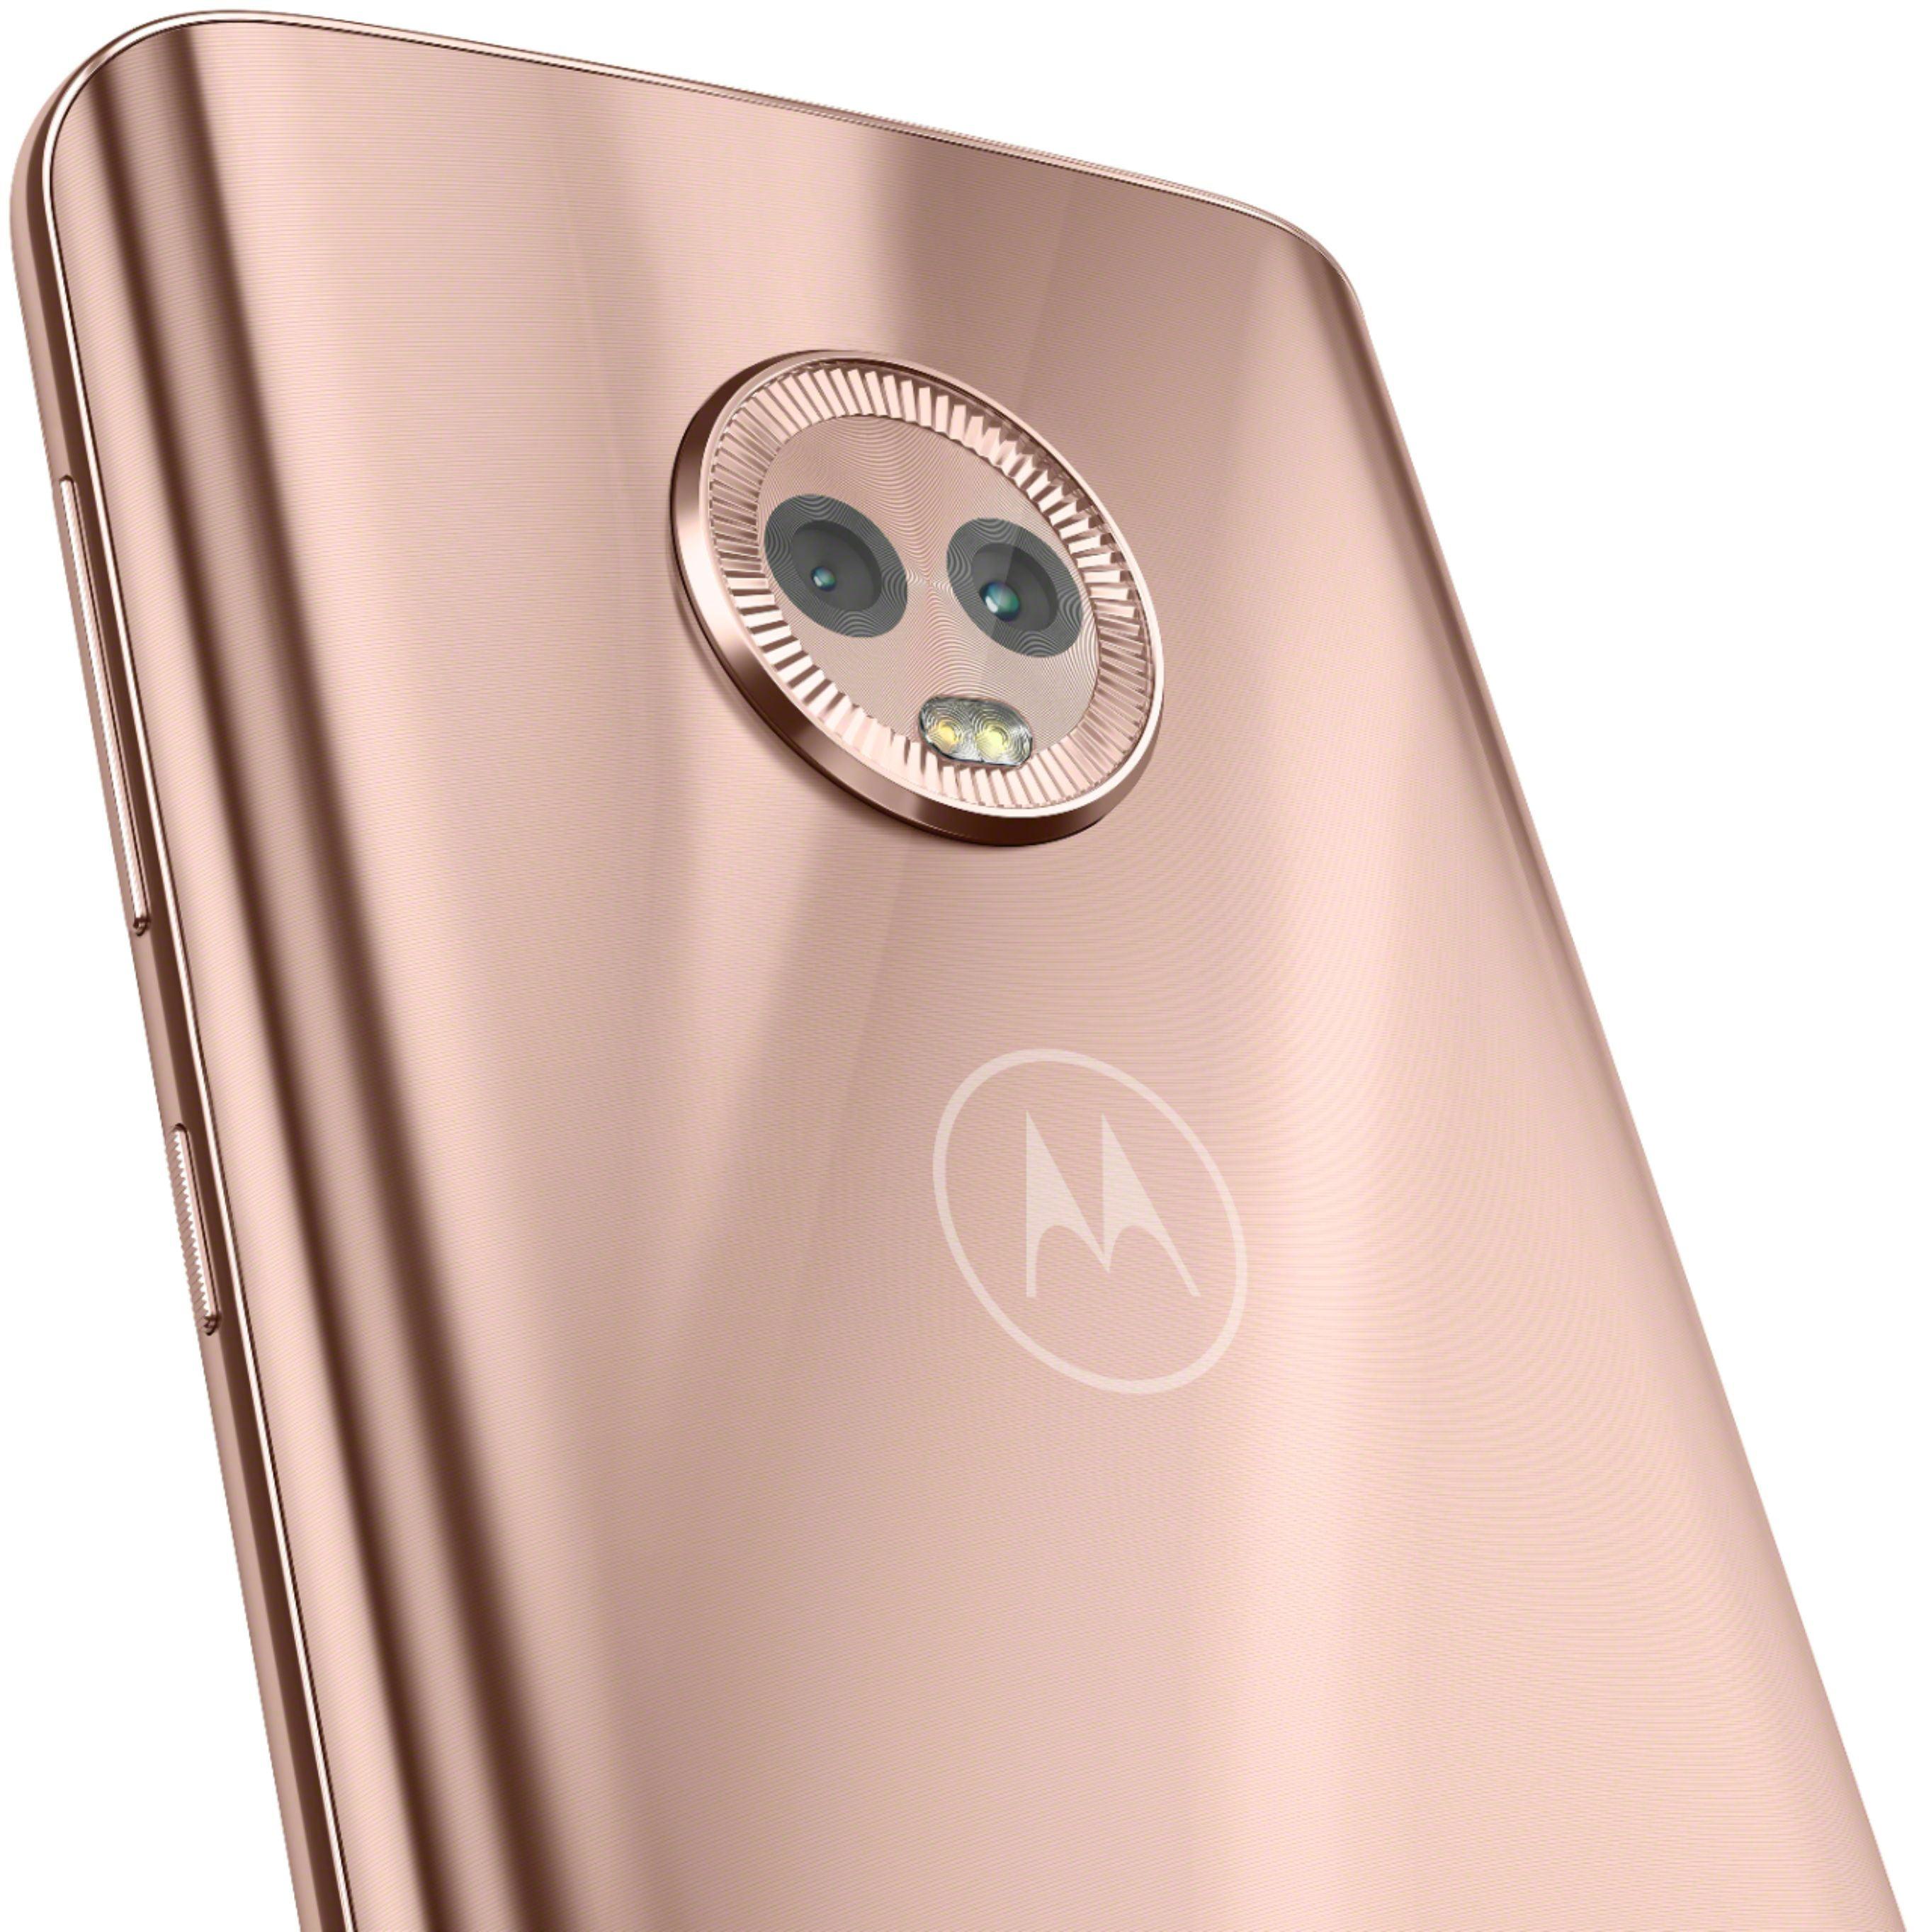 Motorola Moto G6 32GB Unlocked Smartphone Oyster Blush - Walmart com